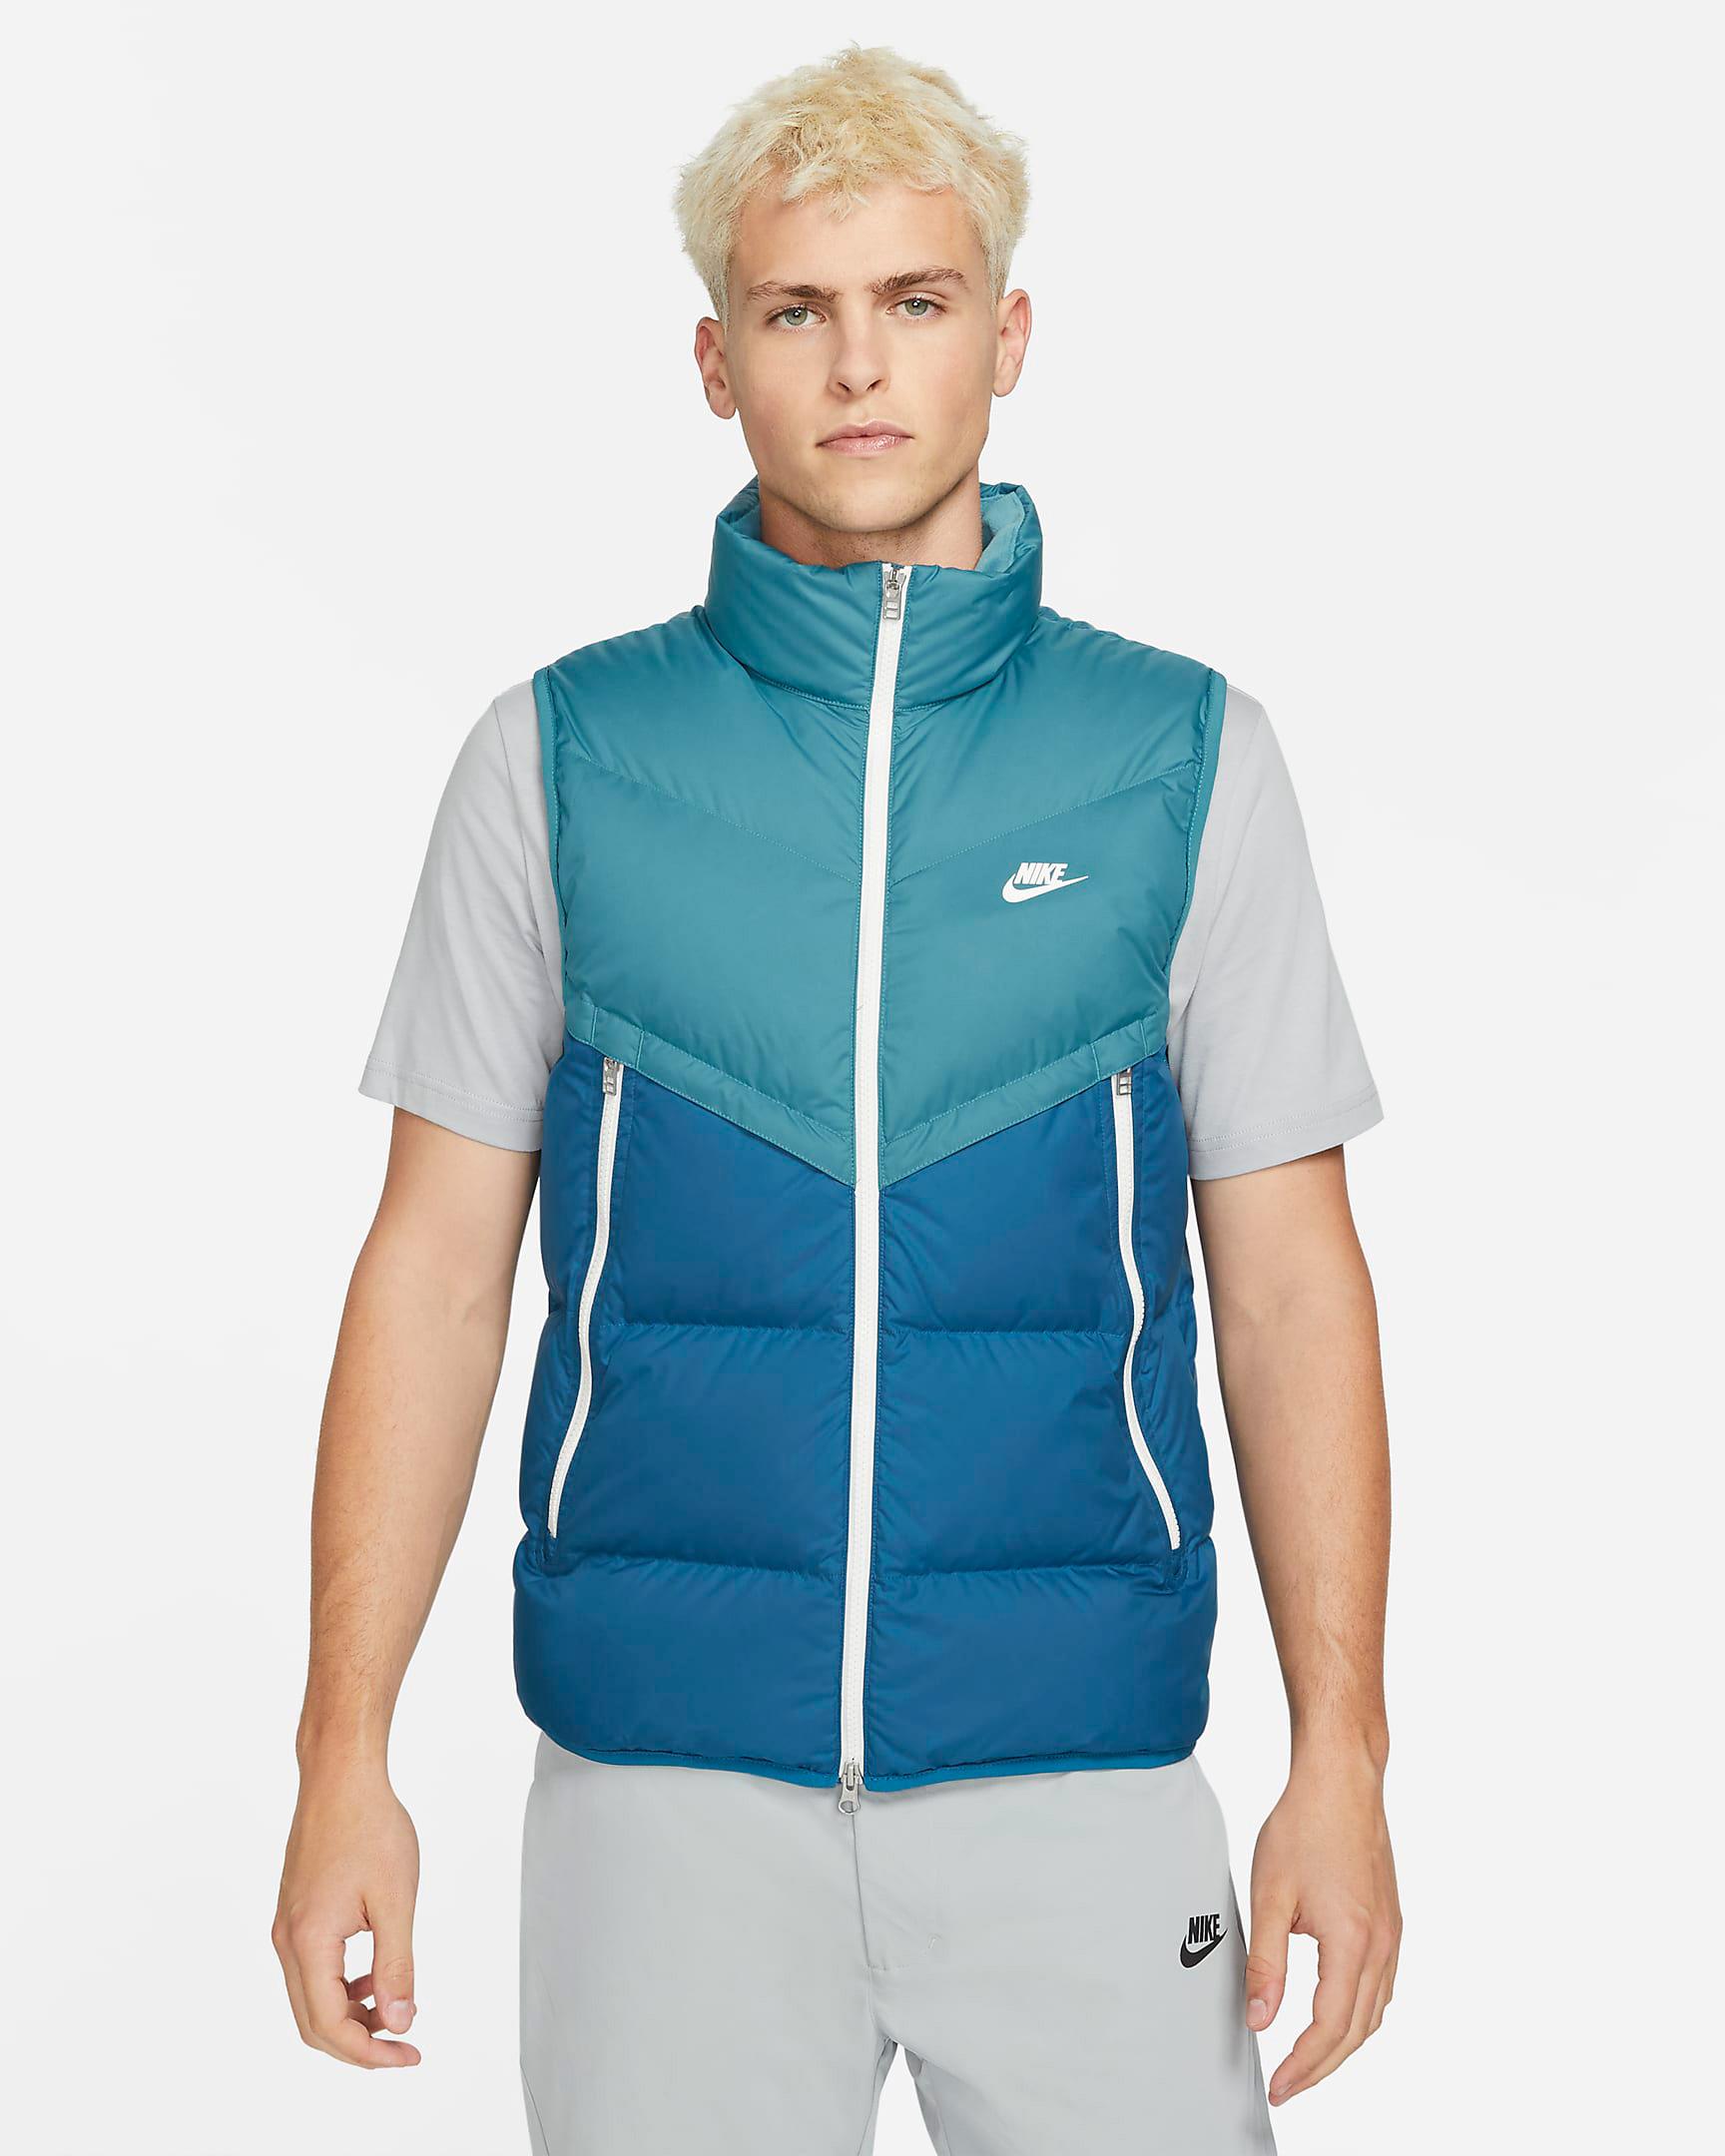 nike-sportswear-storm-fit-windrunner-vest-jacket-rift-blue-court-blue-sail-1